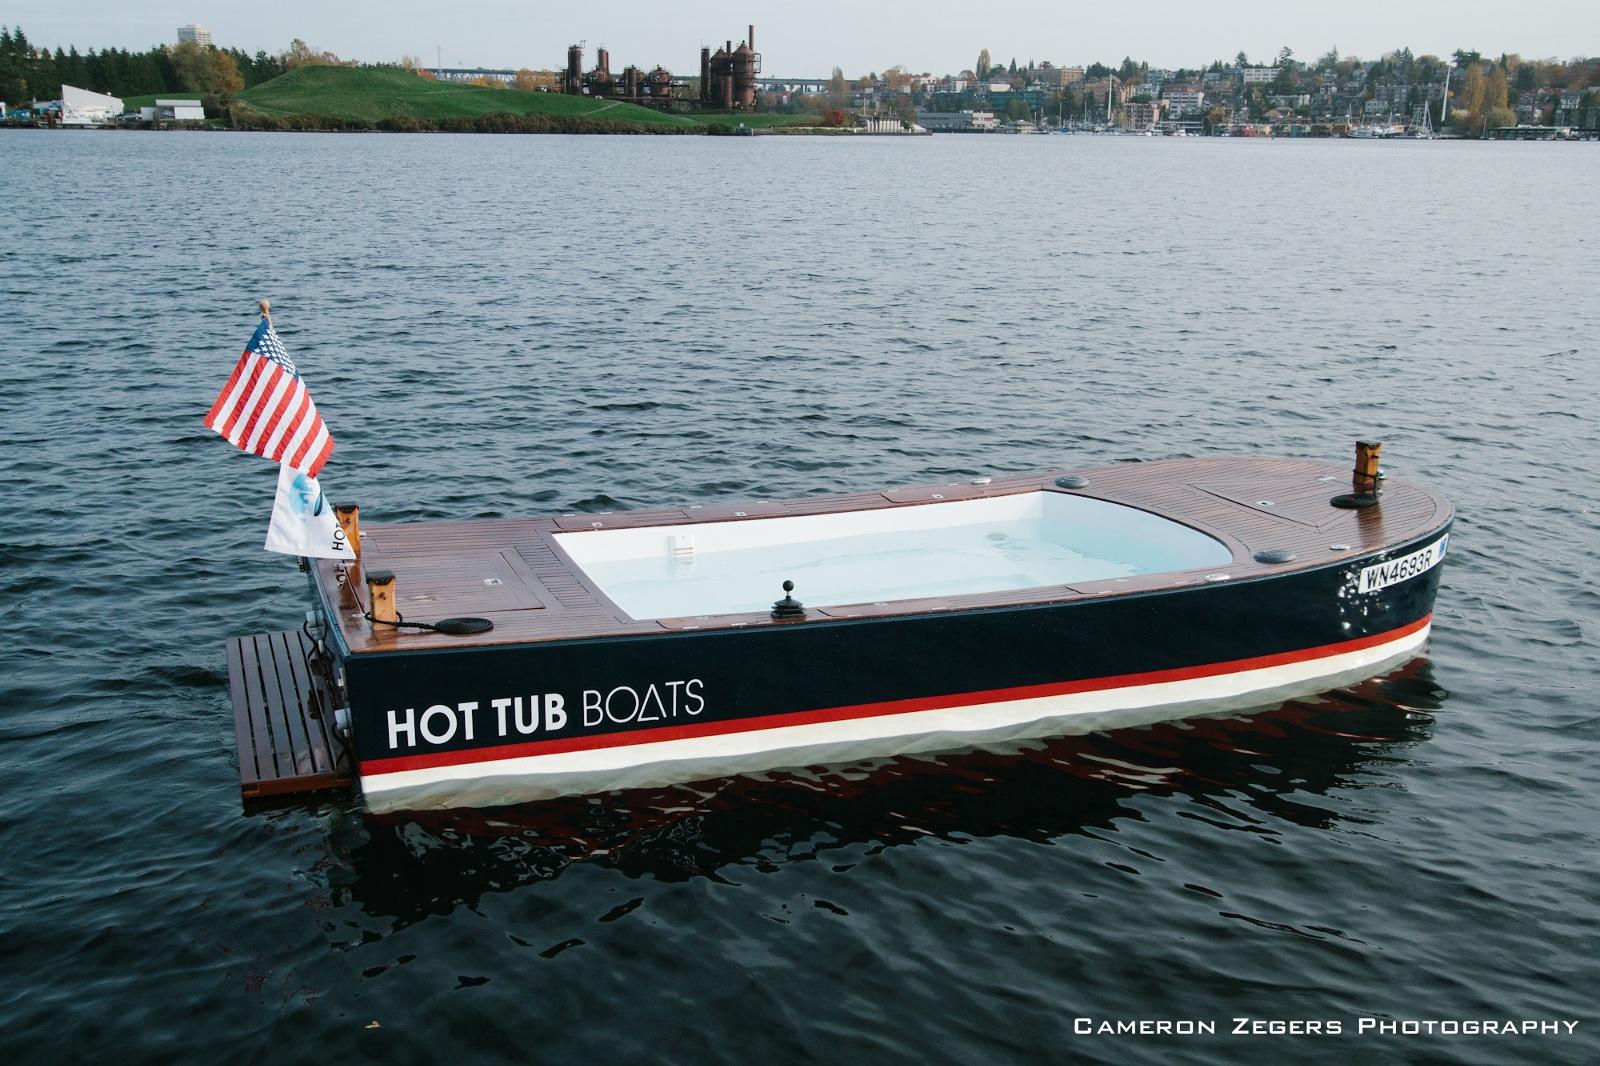 Hot Tub Boats - Seattle, Washington